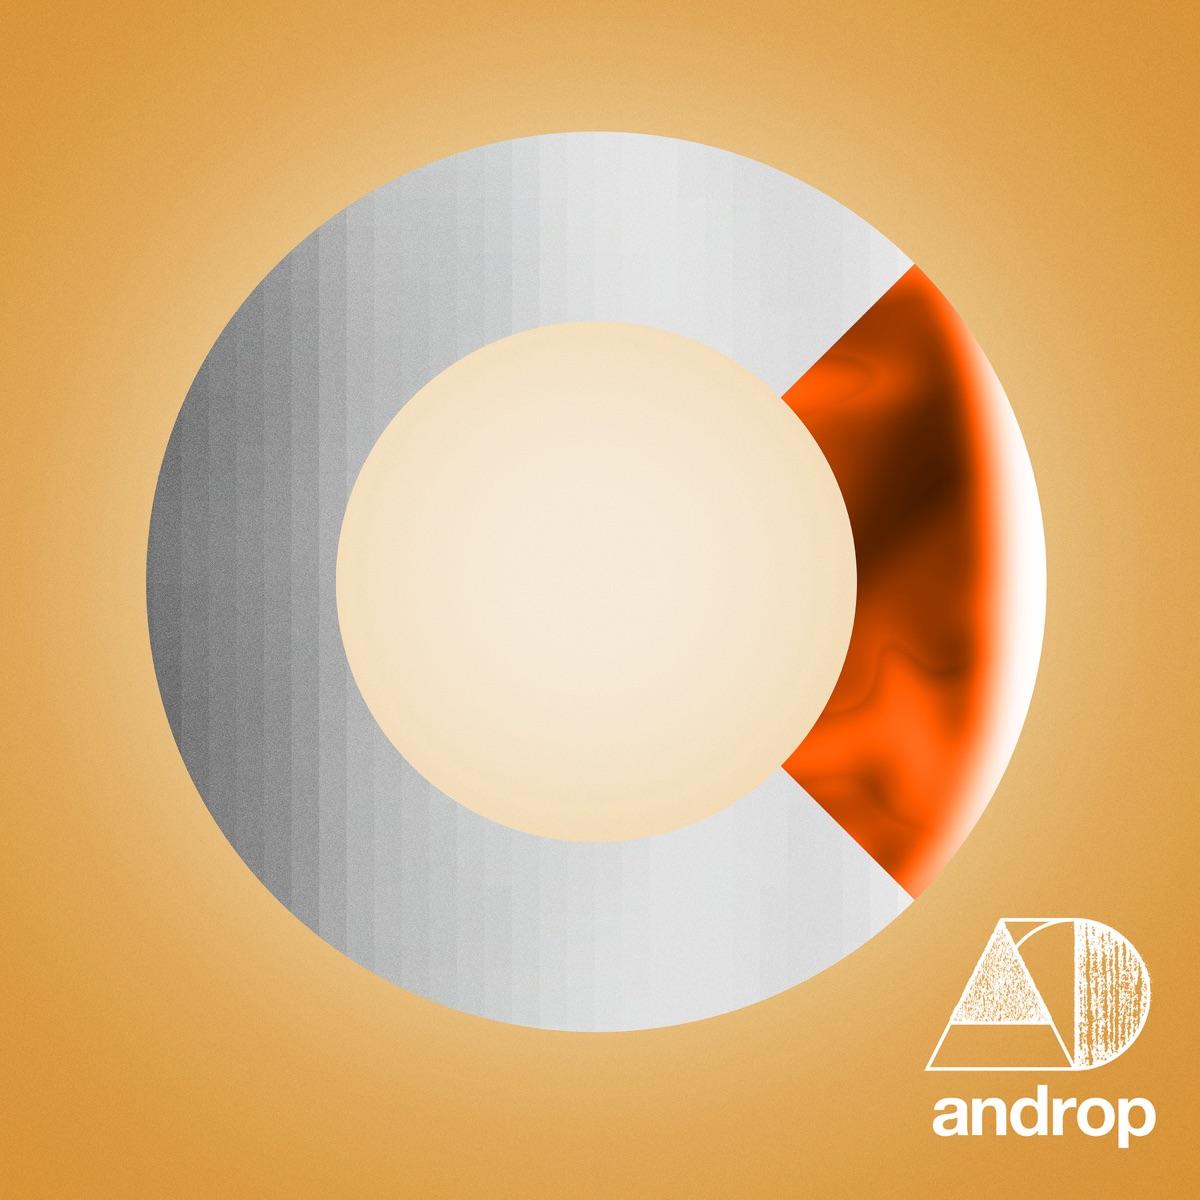 『androp - C』収録の『C』ジャケット